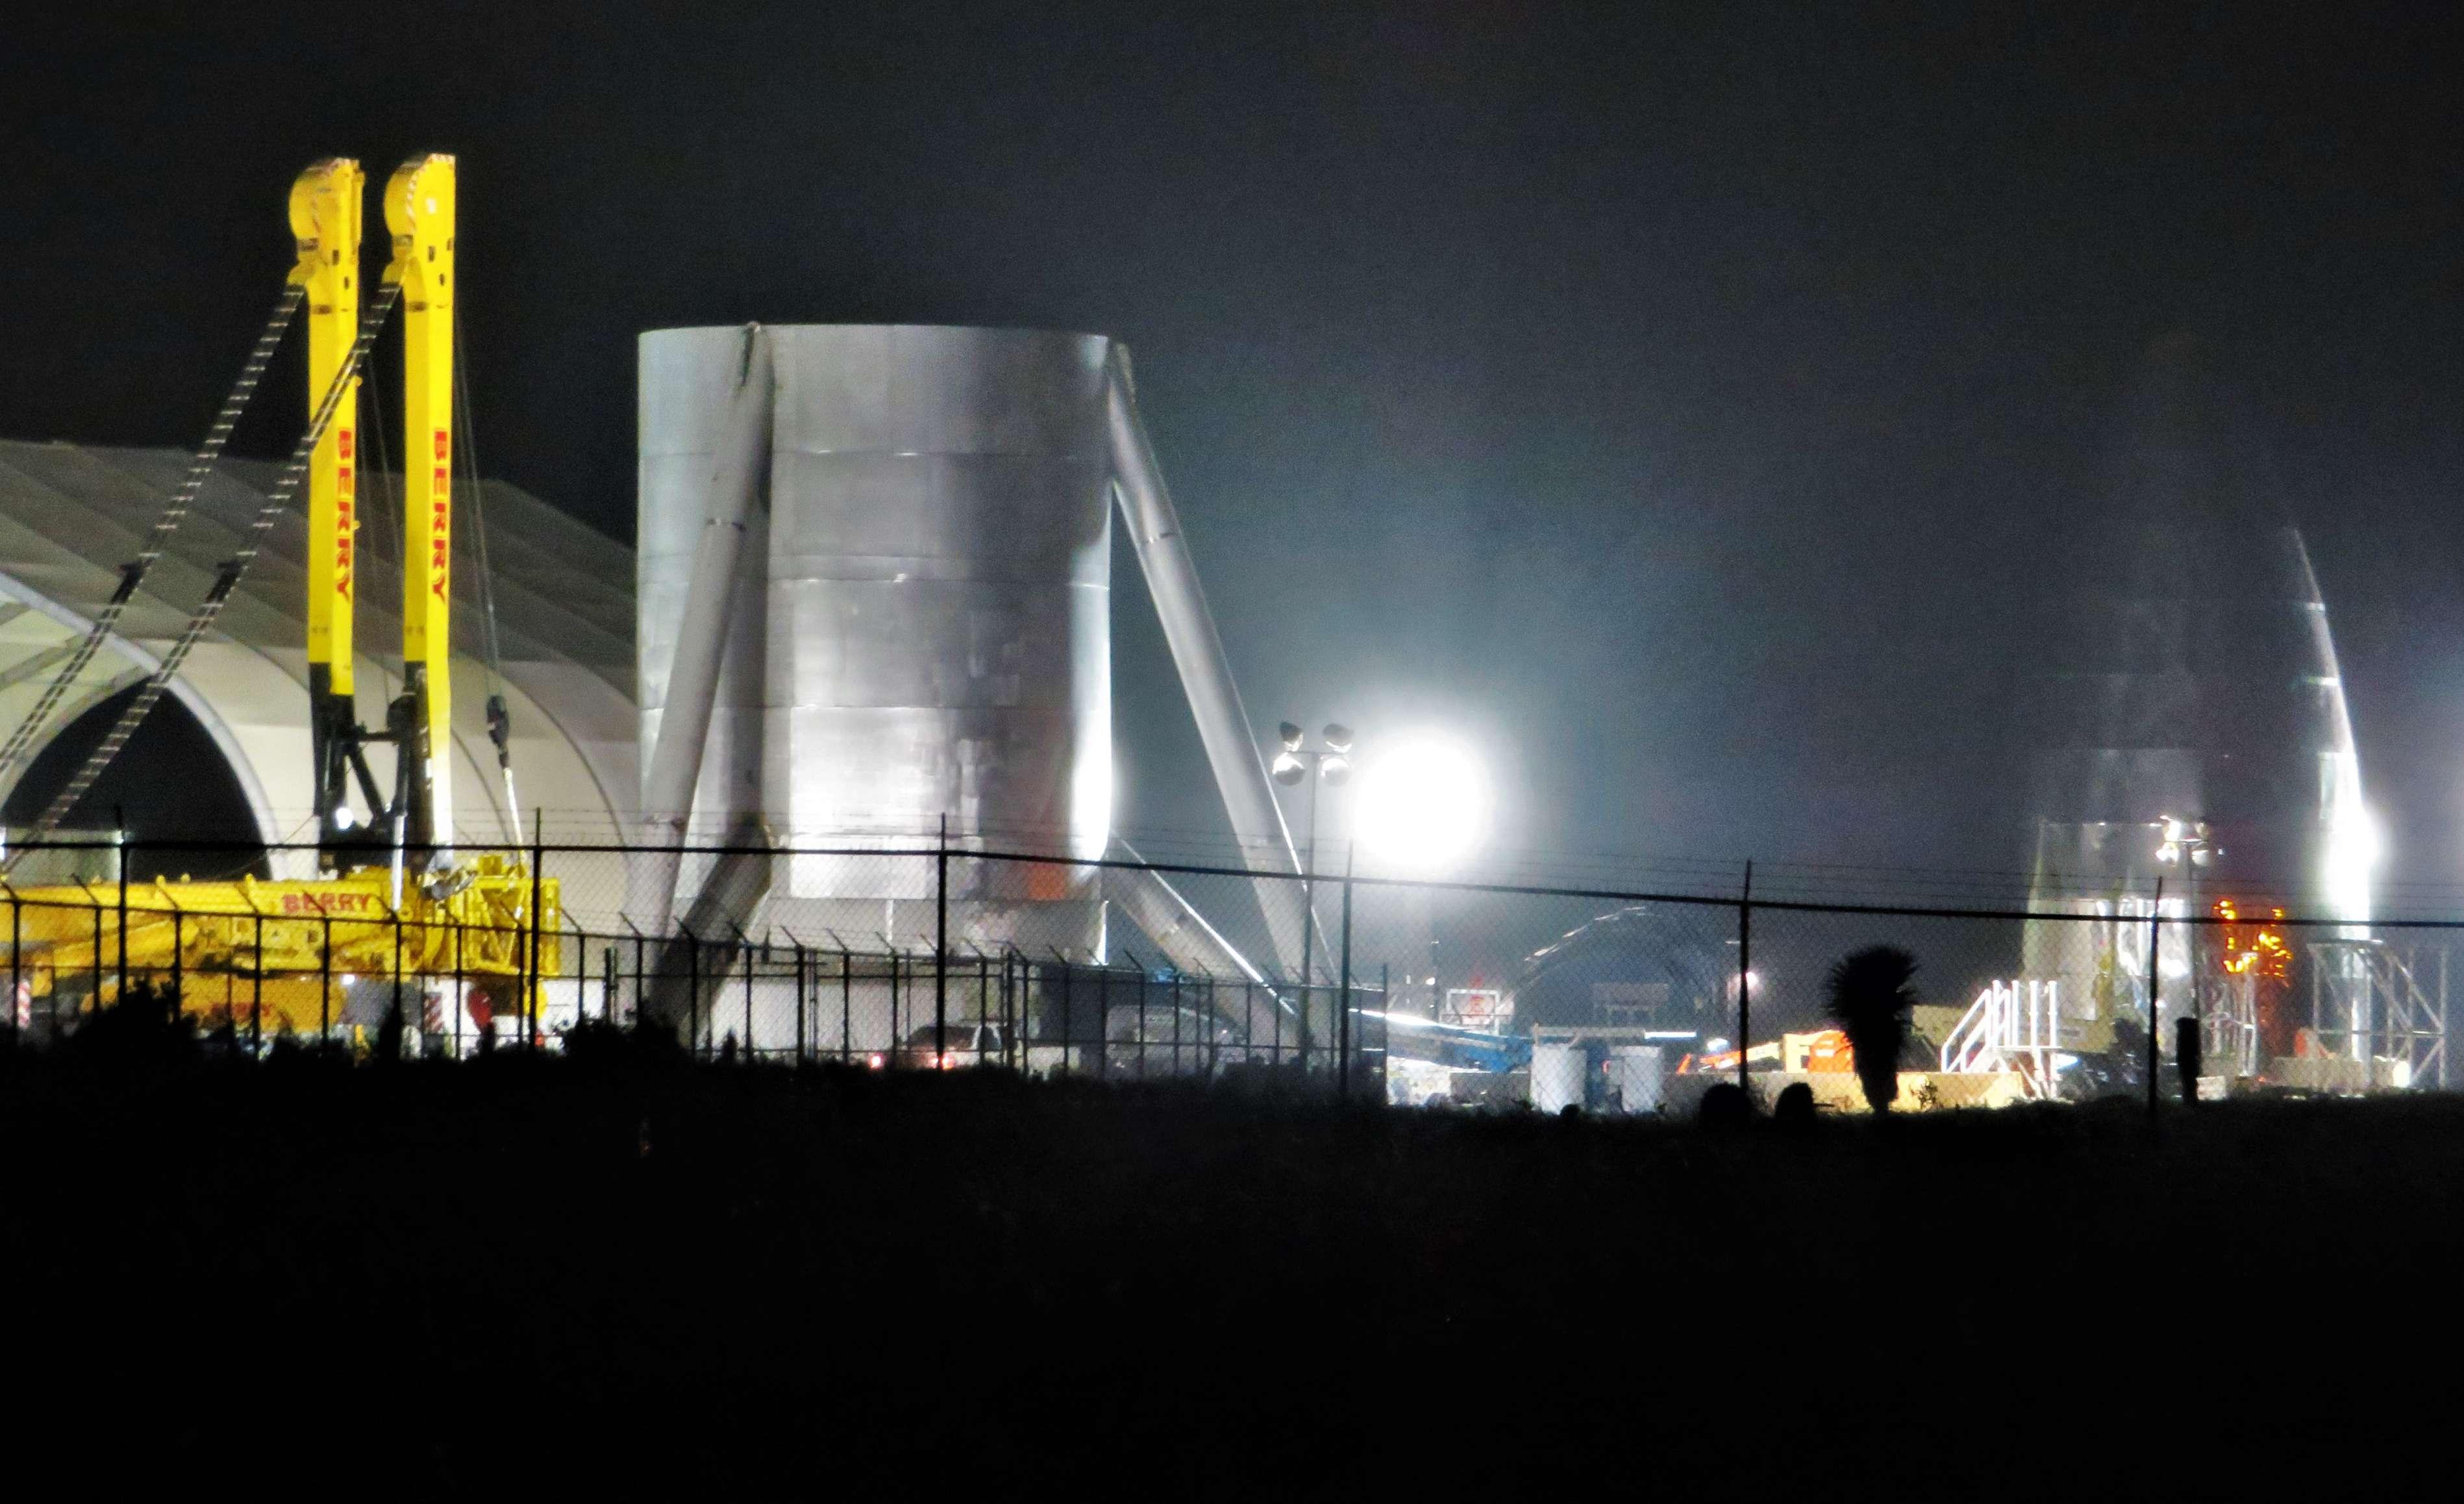 Boca Chica Starship progress 123018 (NSF – bocachicagal) 5(c)